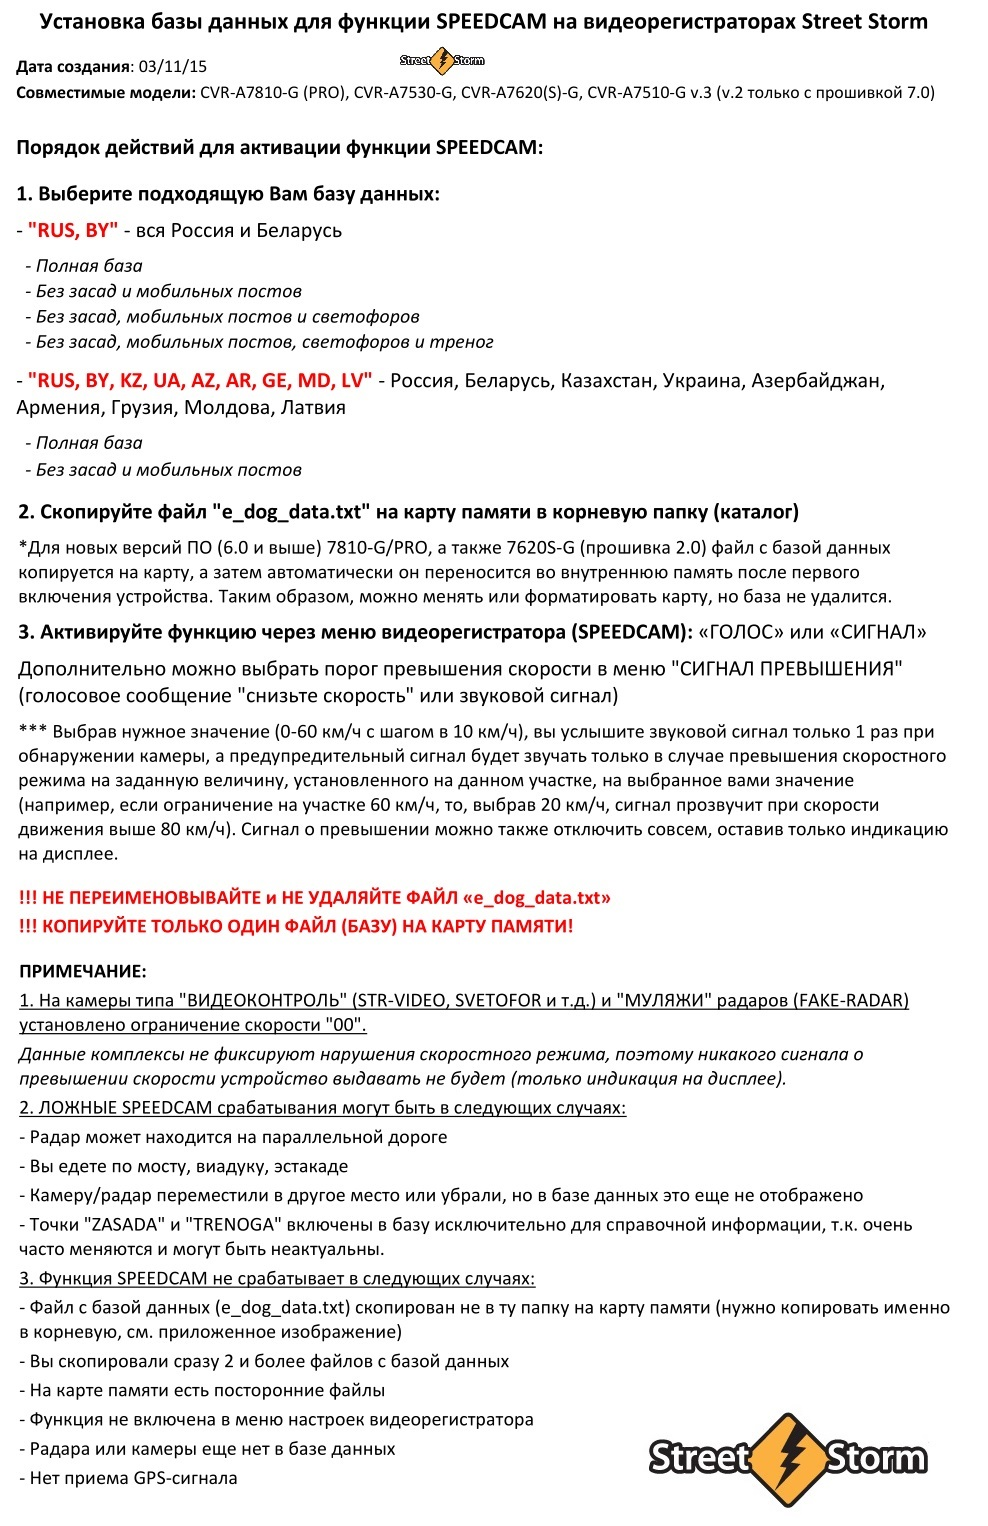 03.11.15 Street Storm Установка базы данных для функции SPEEDCAM.jpg